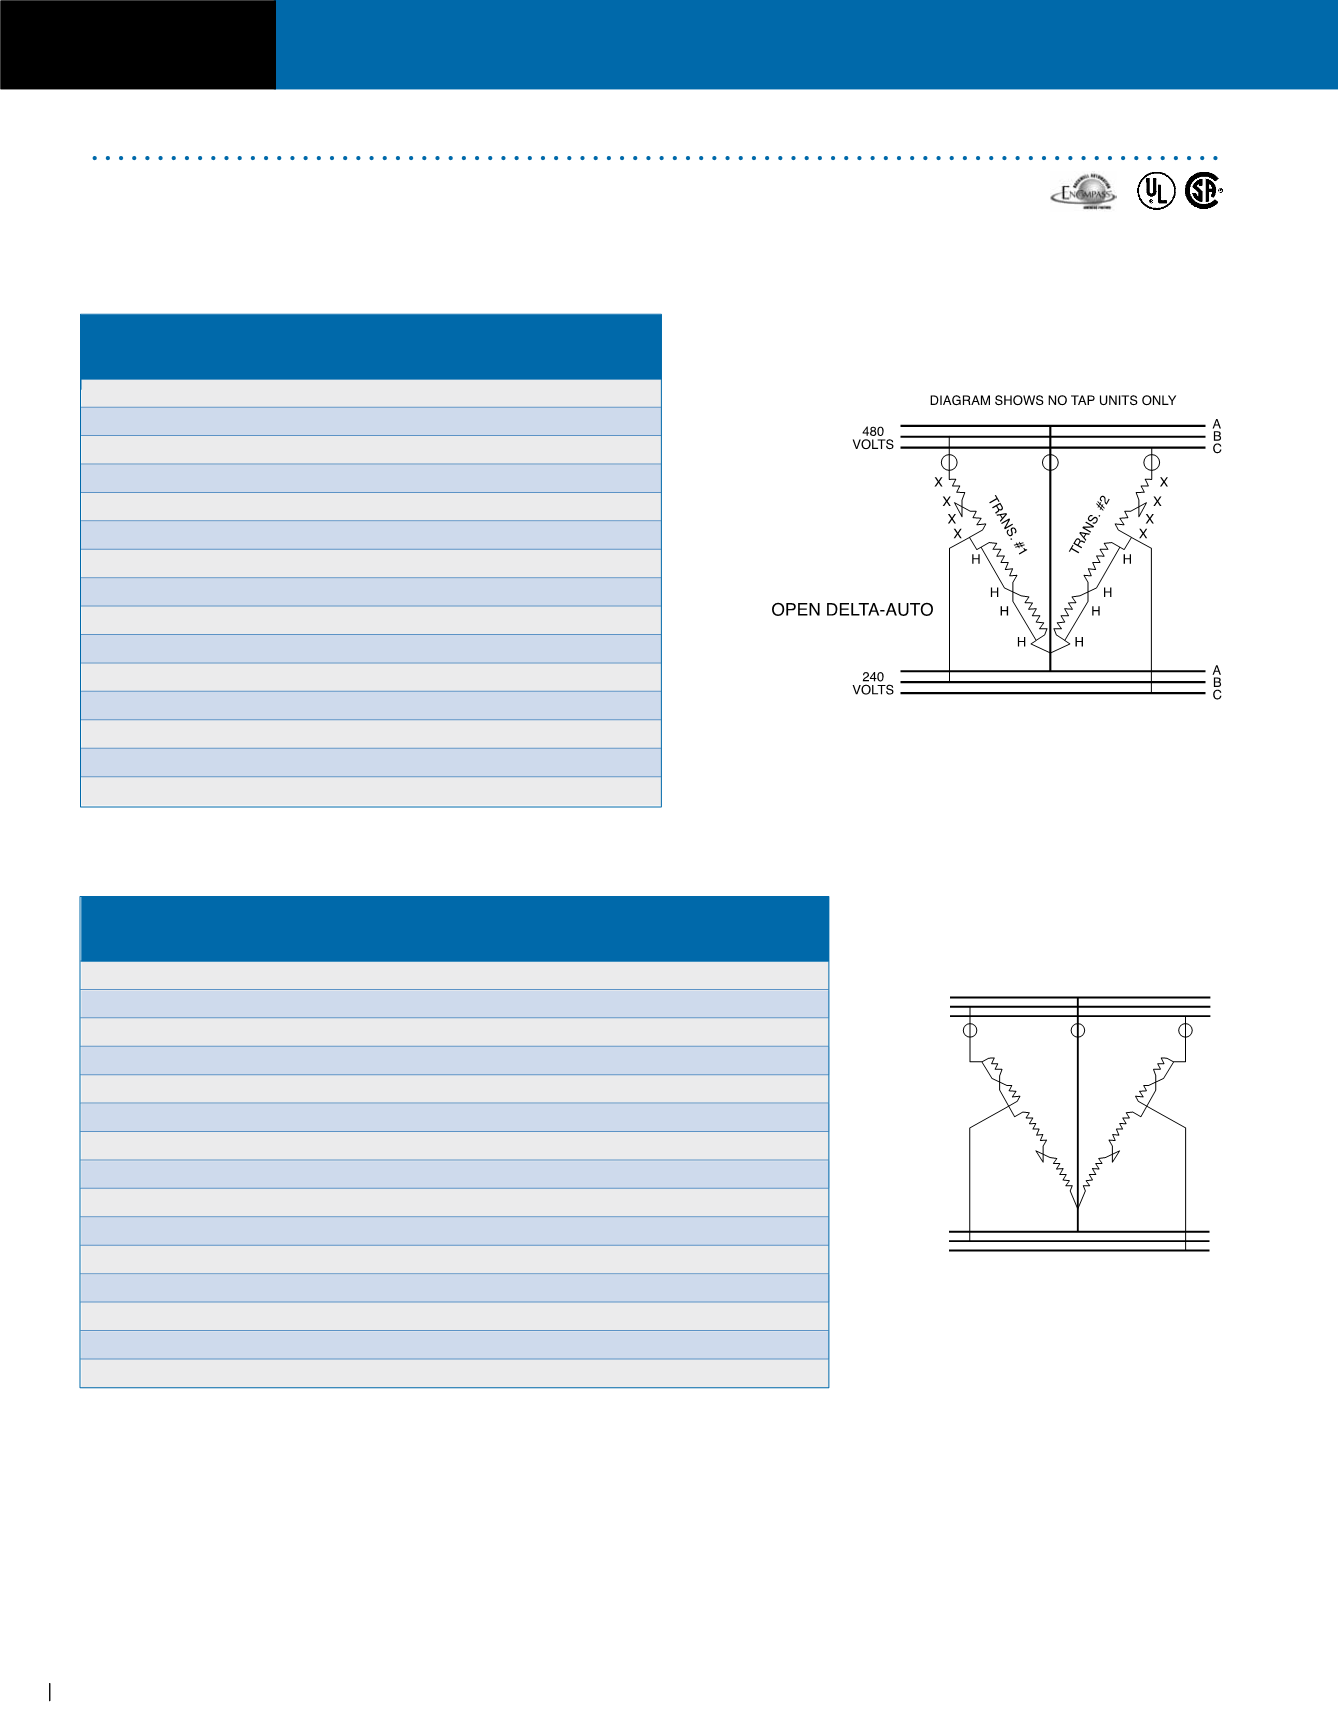 Acm Cat 007 0913 Acme Open Delta Wiring Diagram Page 30